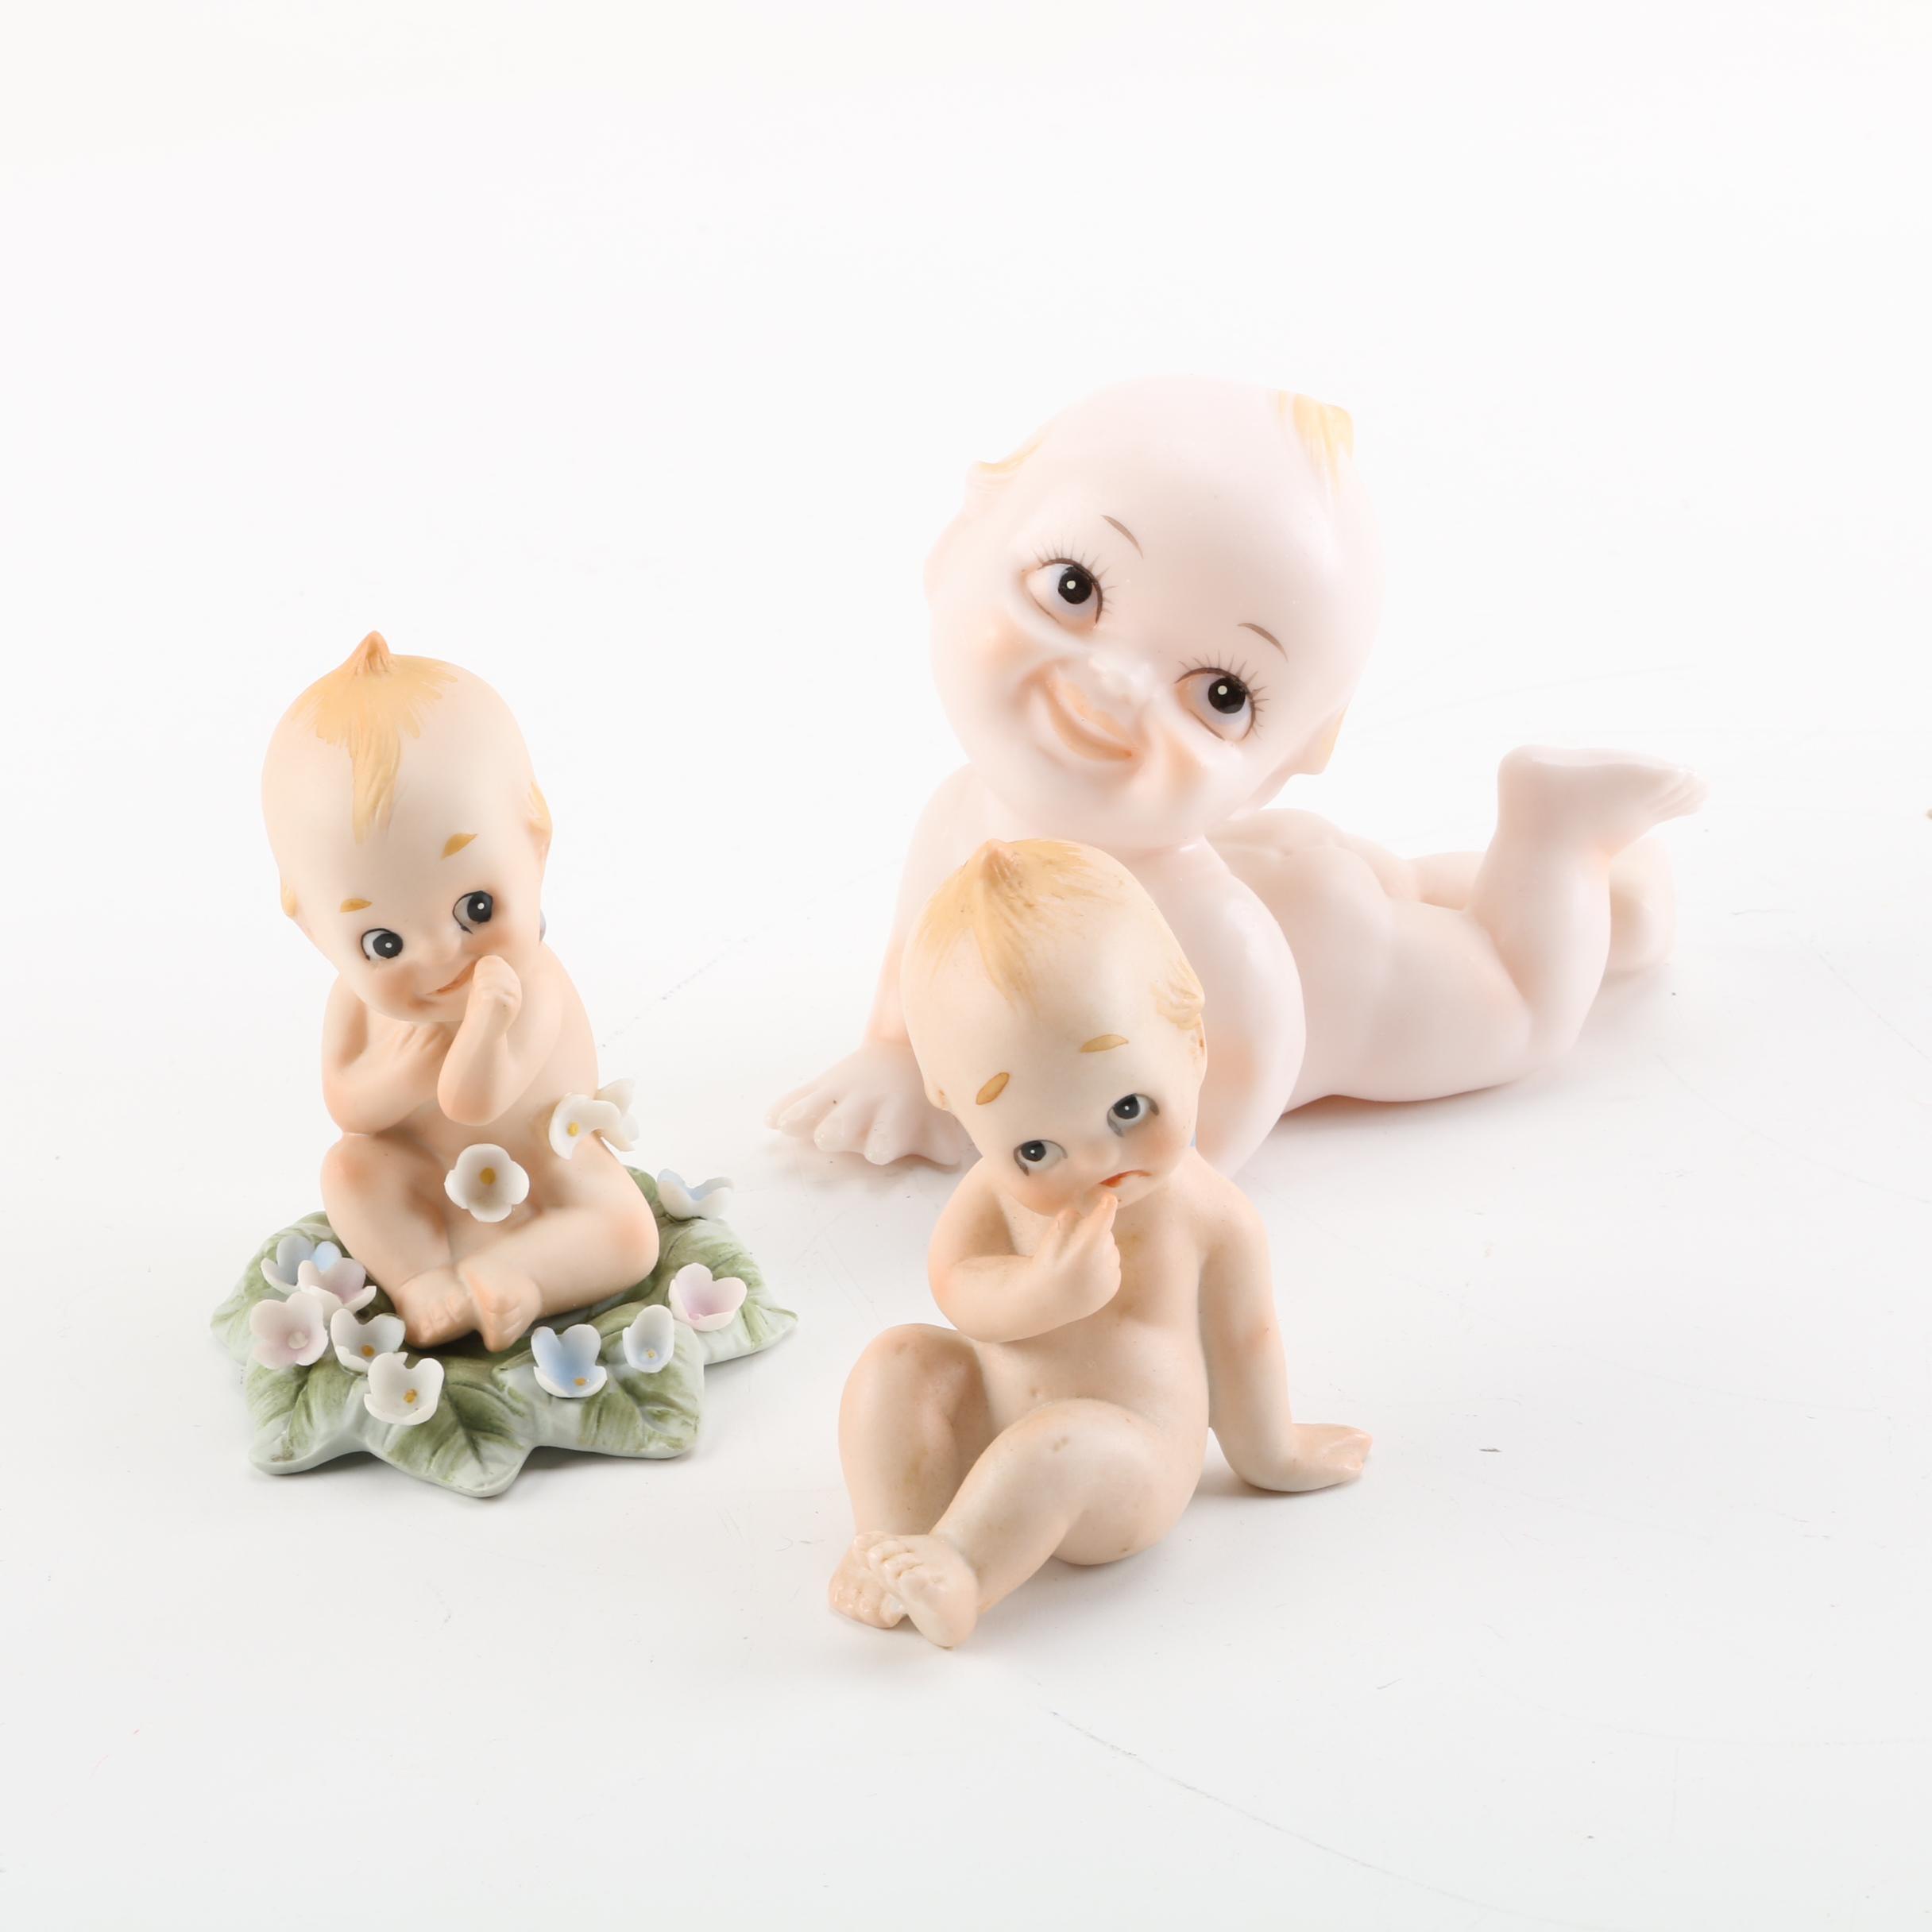 Vintage Porcelain Bisque Kewpie Figurines Featuring Lefton and Norcrest